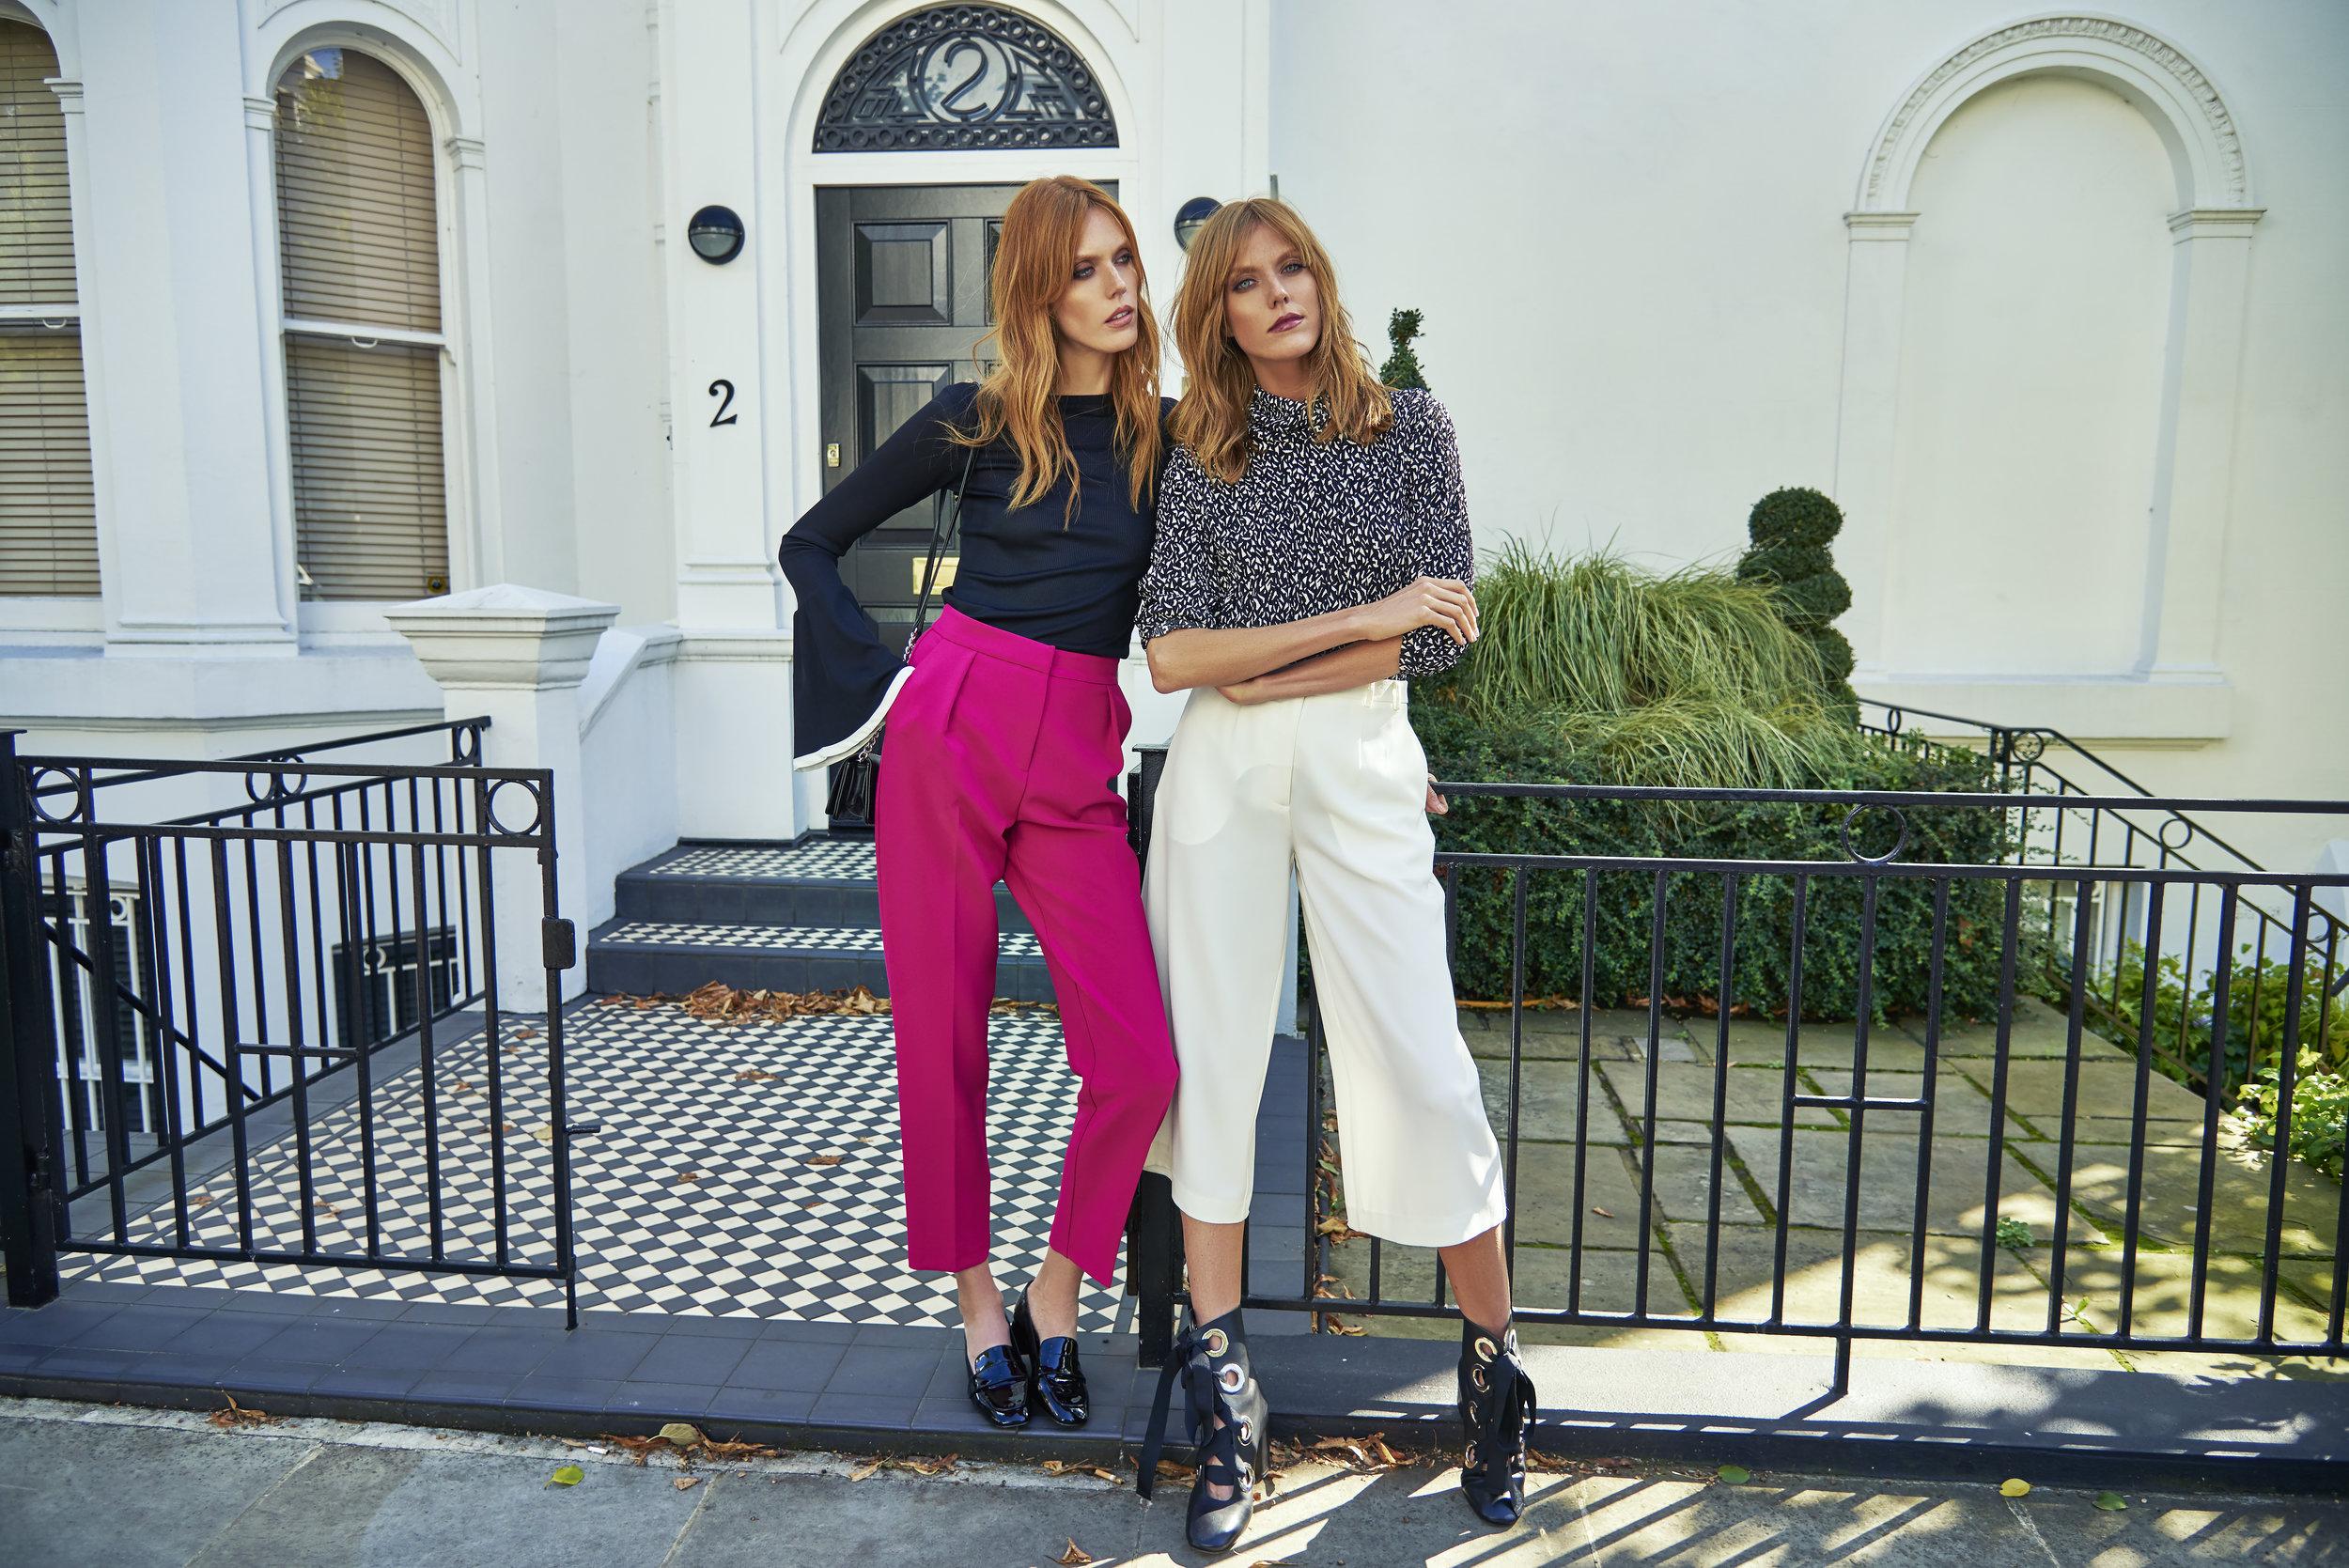 Alice wears:  Top  Topshop ,Trousers Stylists own,Boots  Miista    Caroline wears: Top  Zara ,Trousers  Topshop ,Shoes  River Island